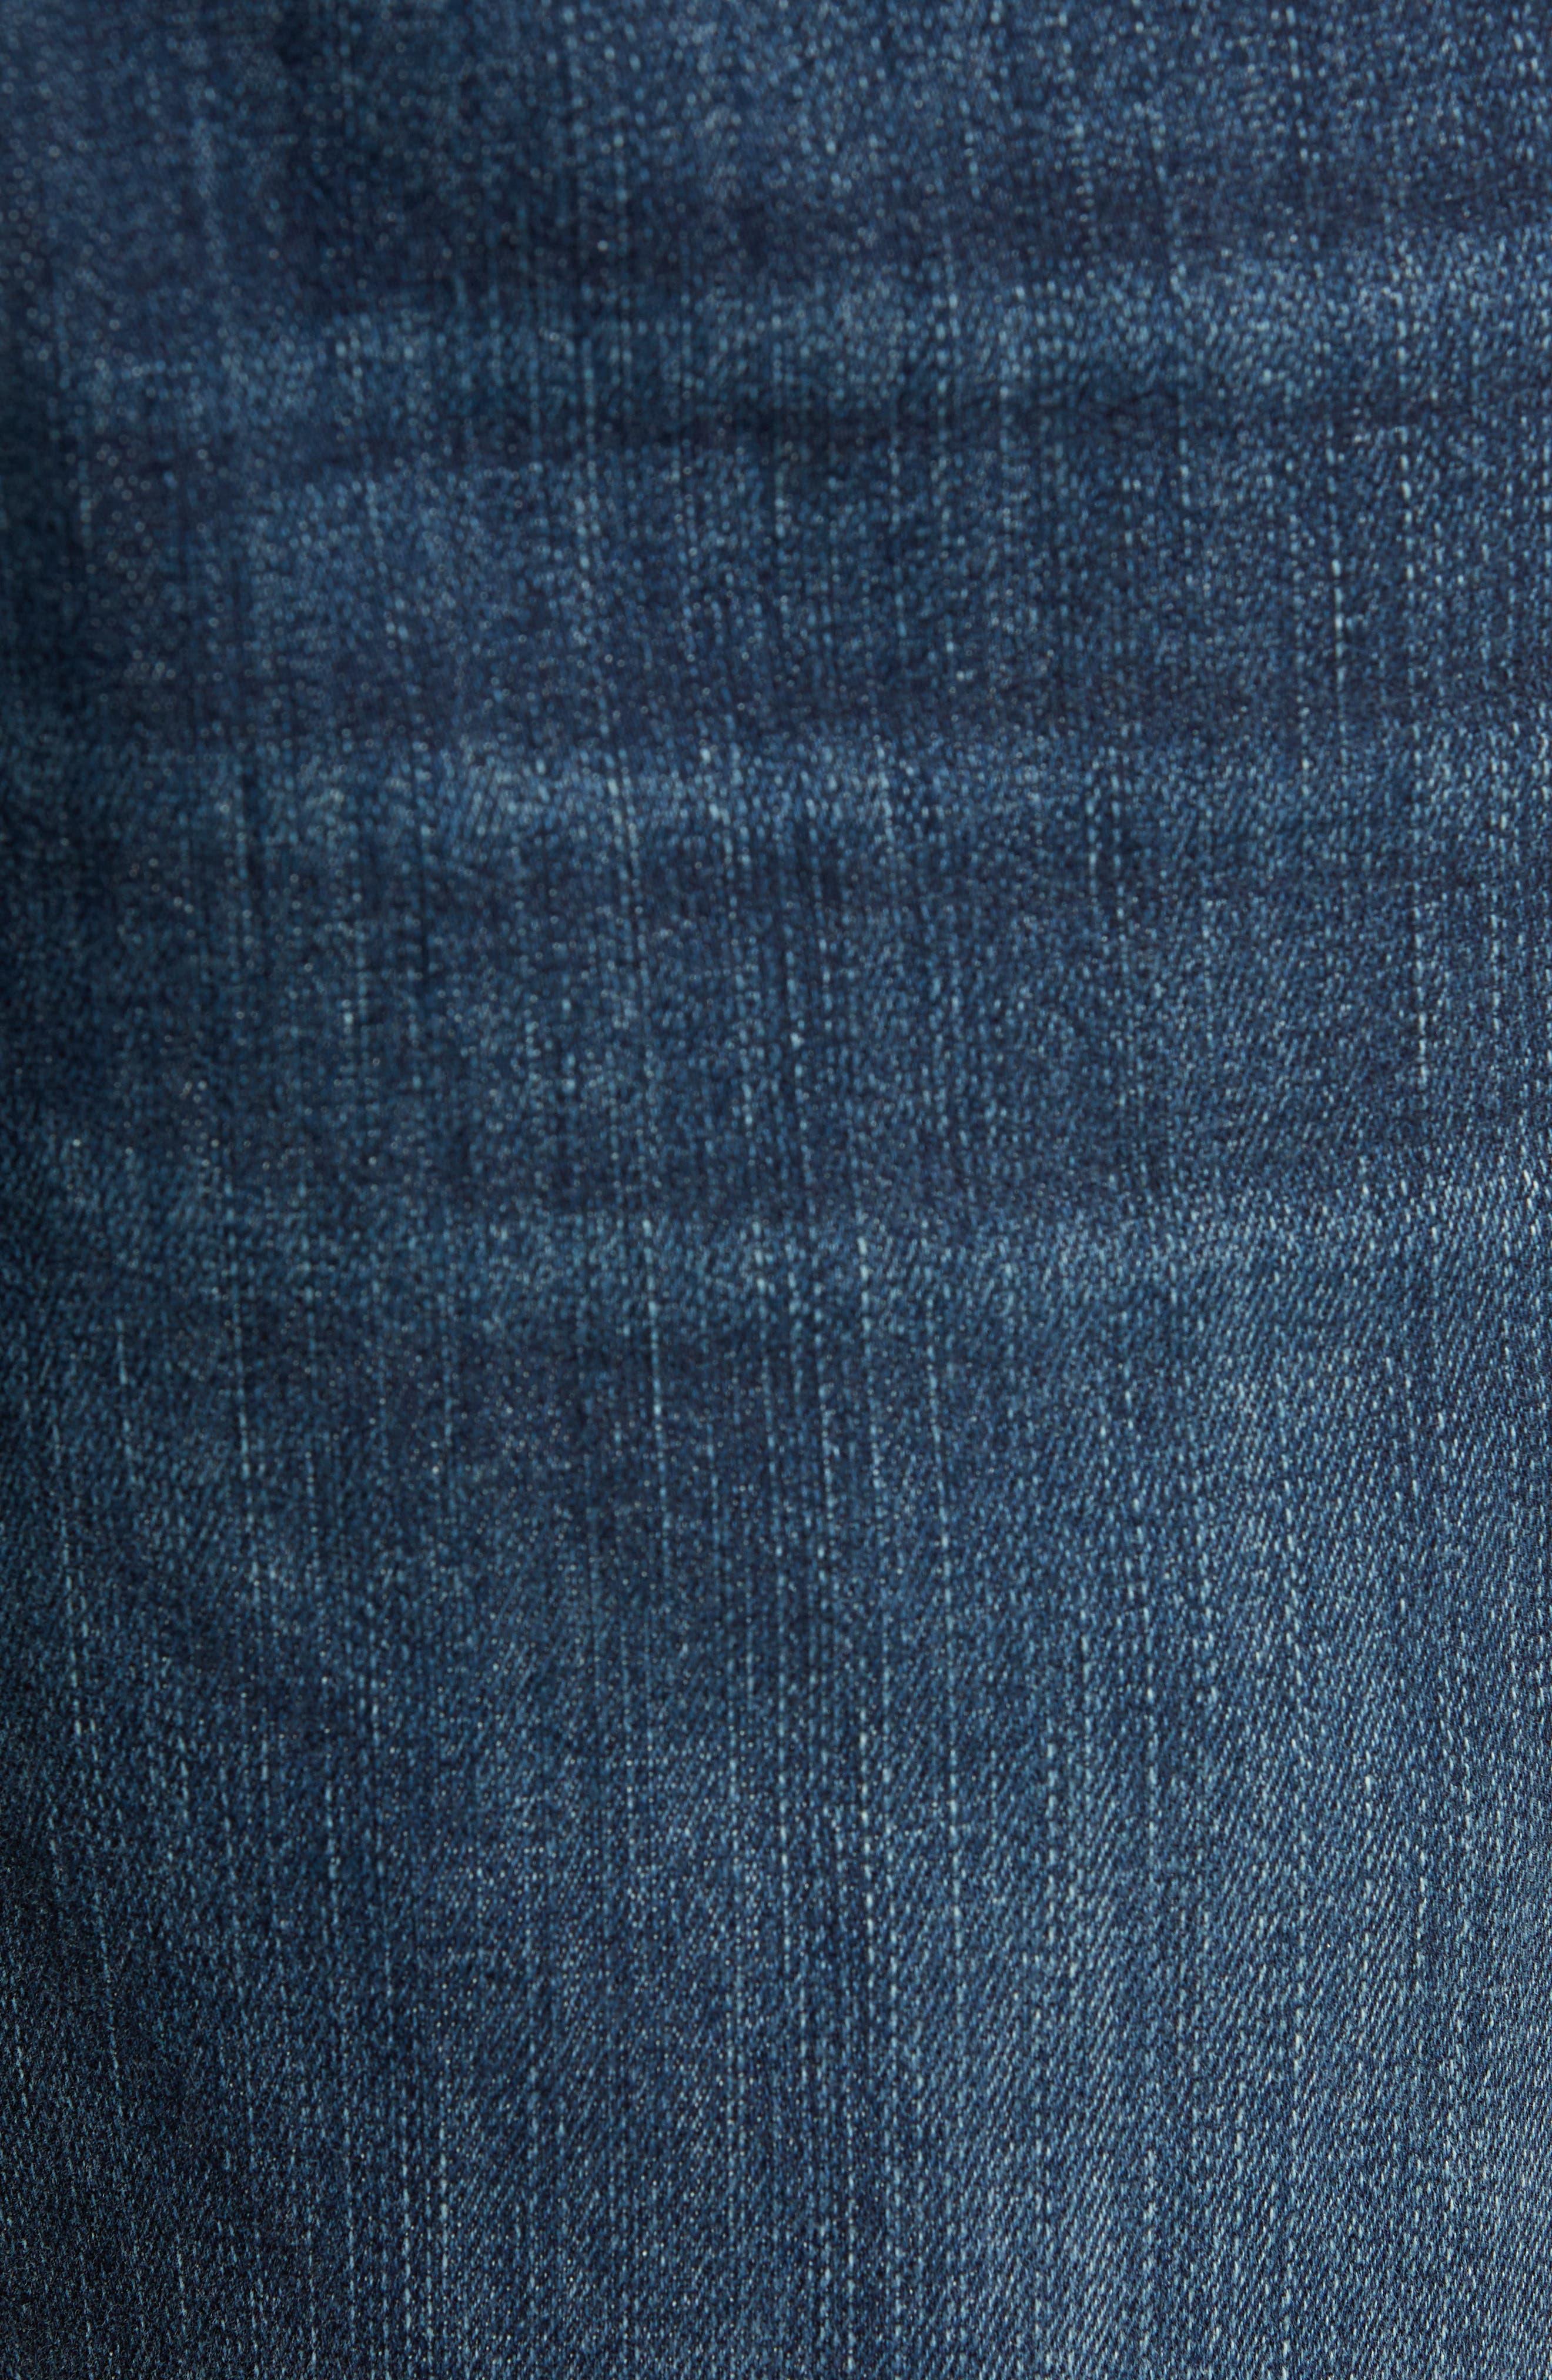 ,                             Transcend Vintage Federal Slim Straight Leg Jeans,                             Alternate thumbnail 6, color,                             400